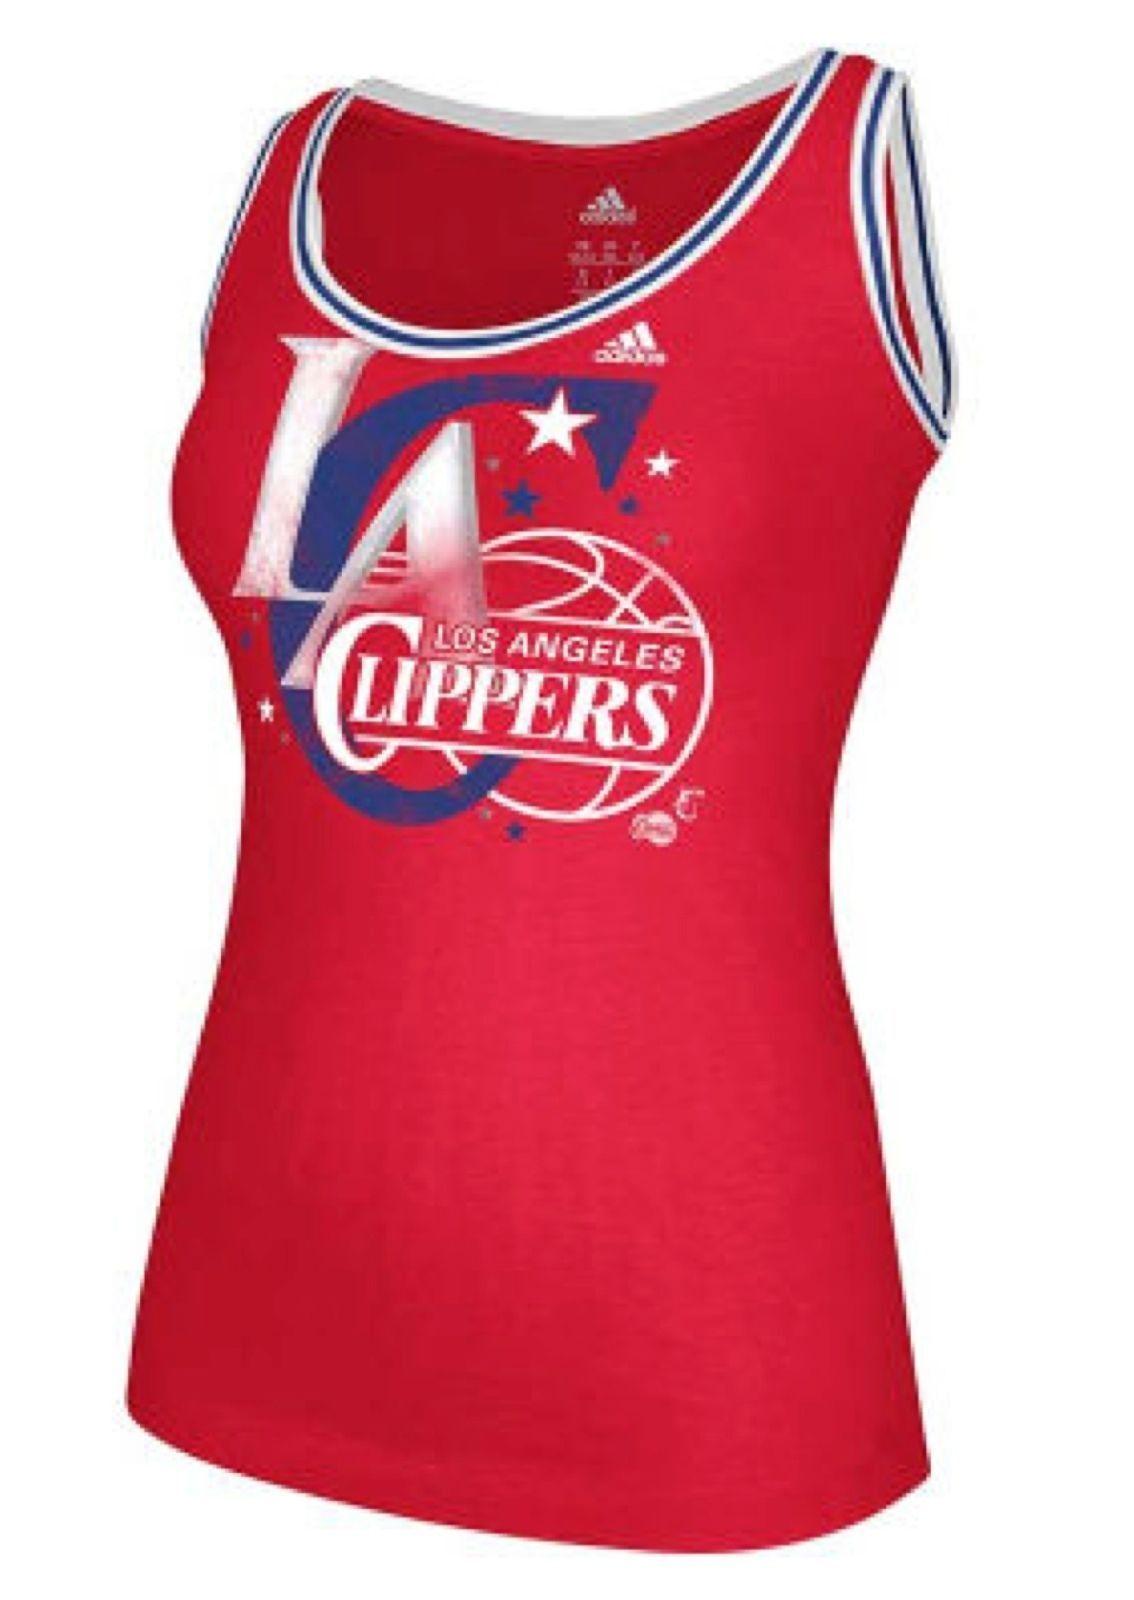 Camiseta sin mangas para mujer Los Angeles Clippers Adidas - Rojo